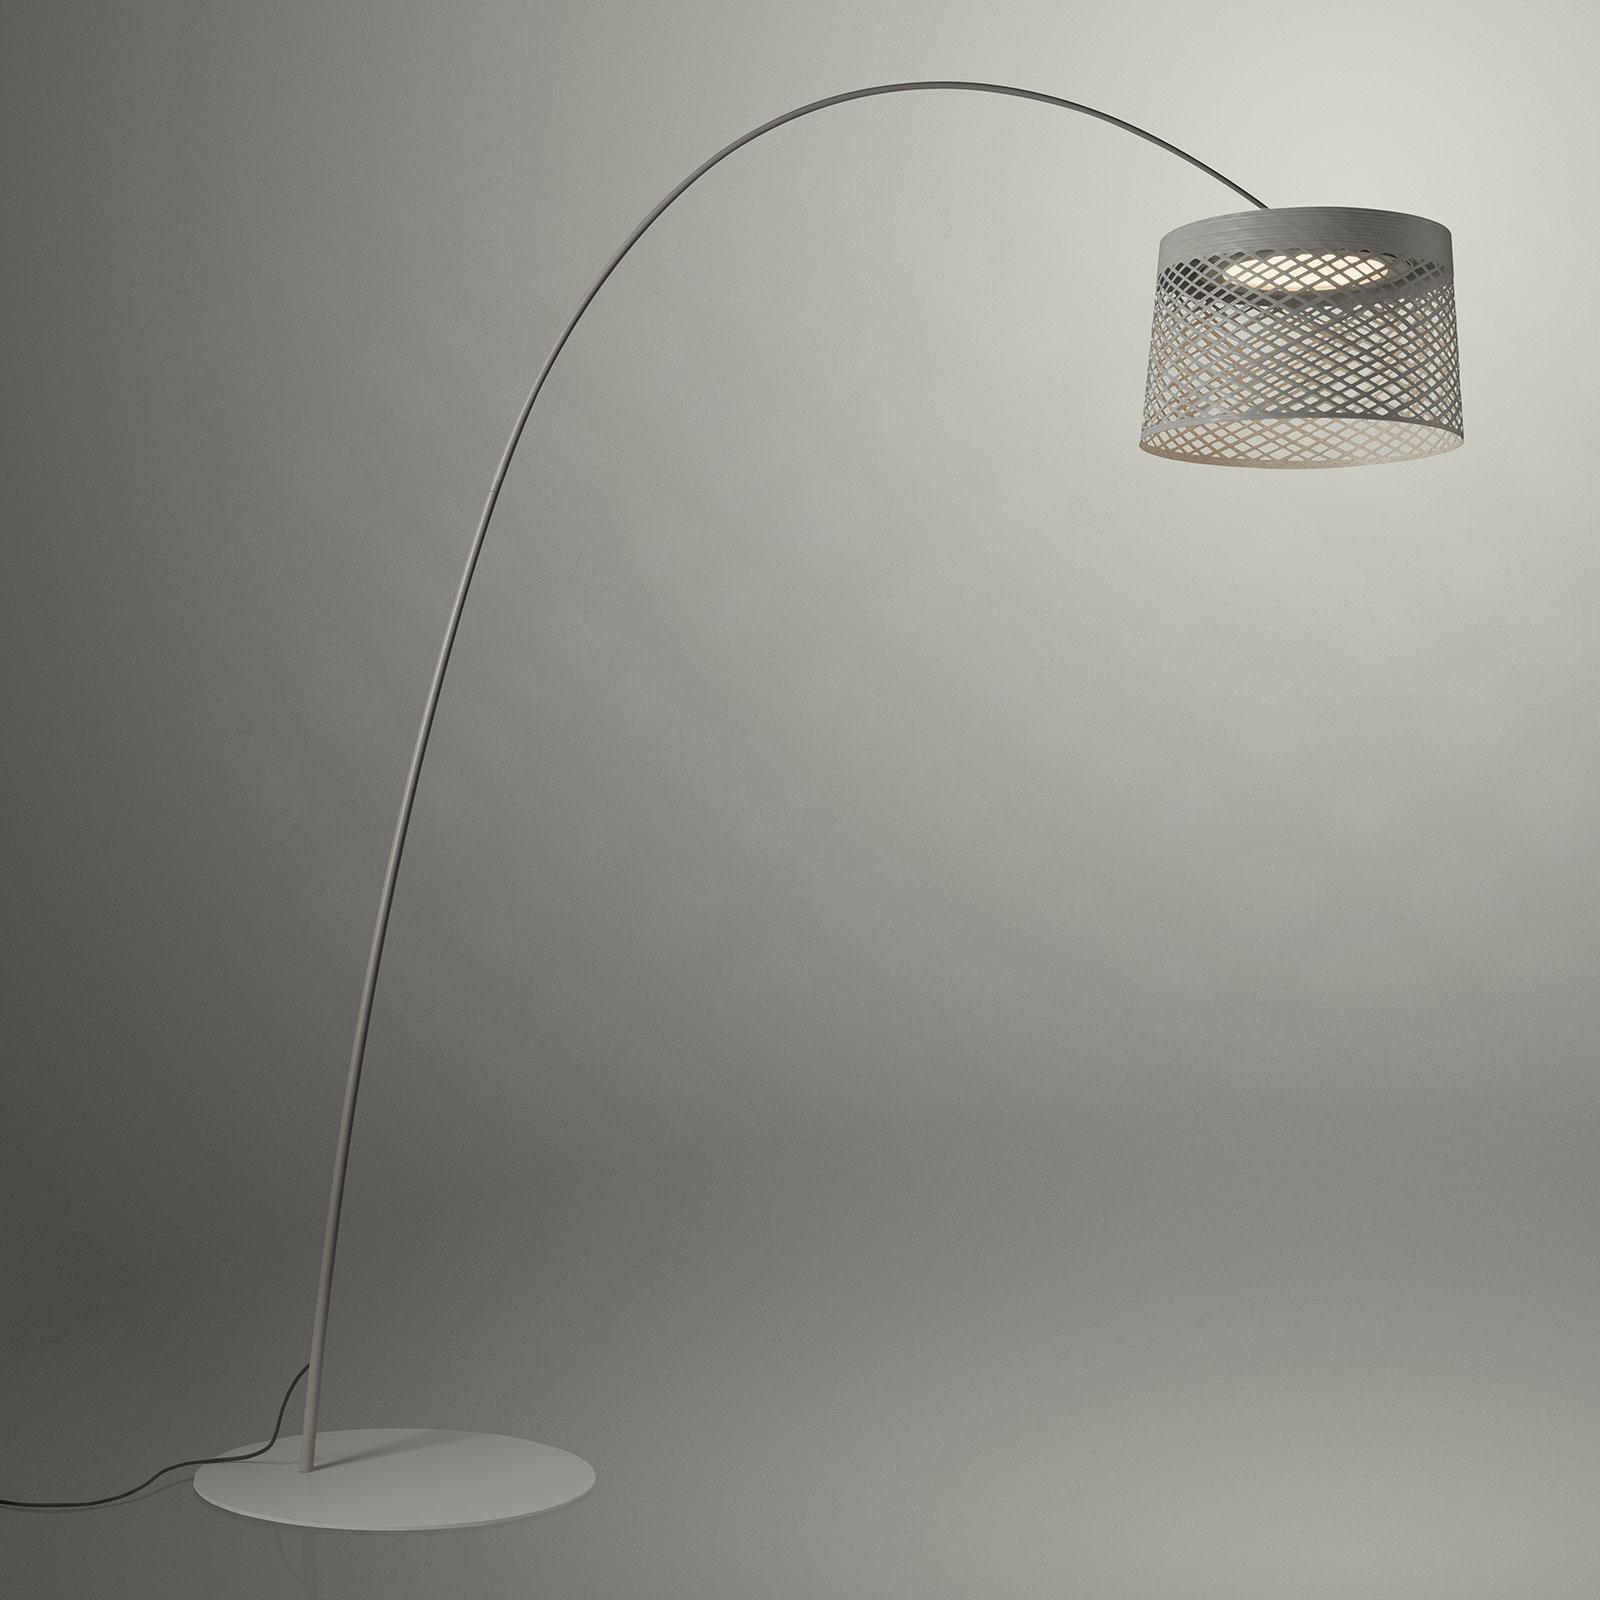 Foscarini Twiggy Grid lampadaire arqué LED, grège